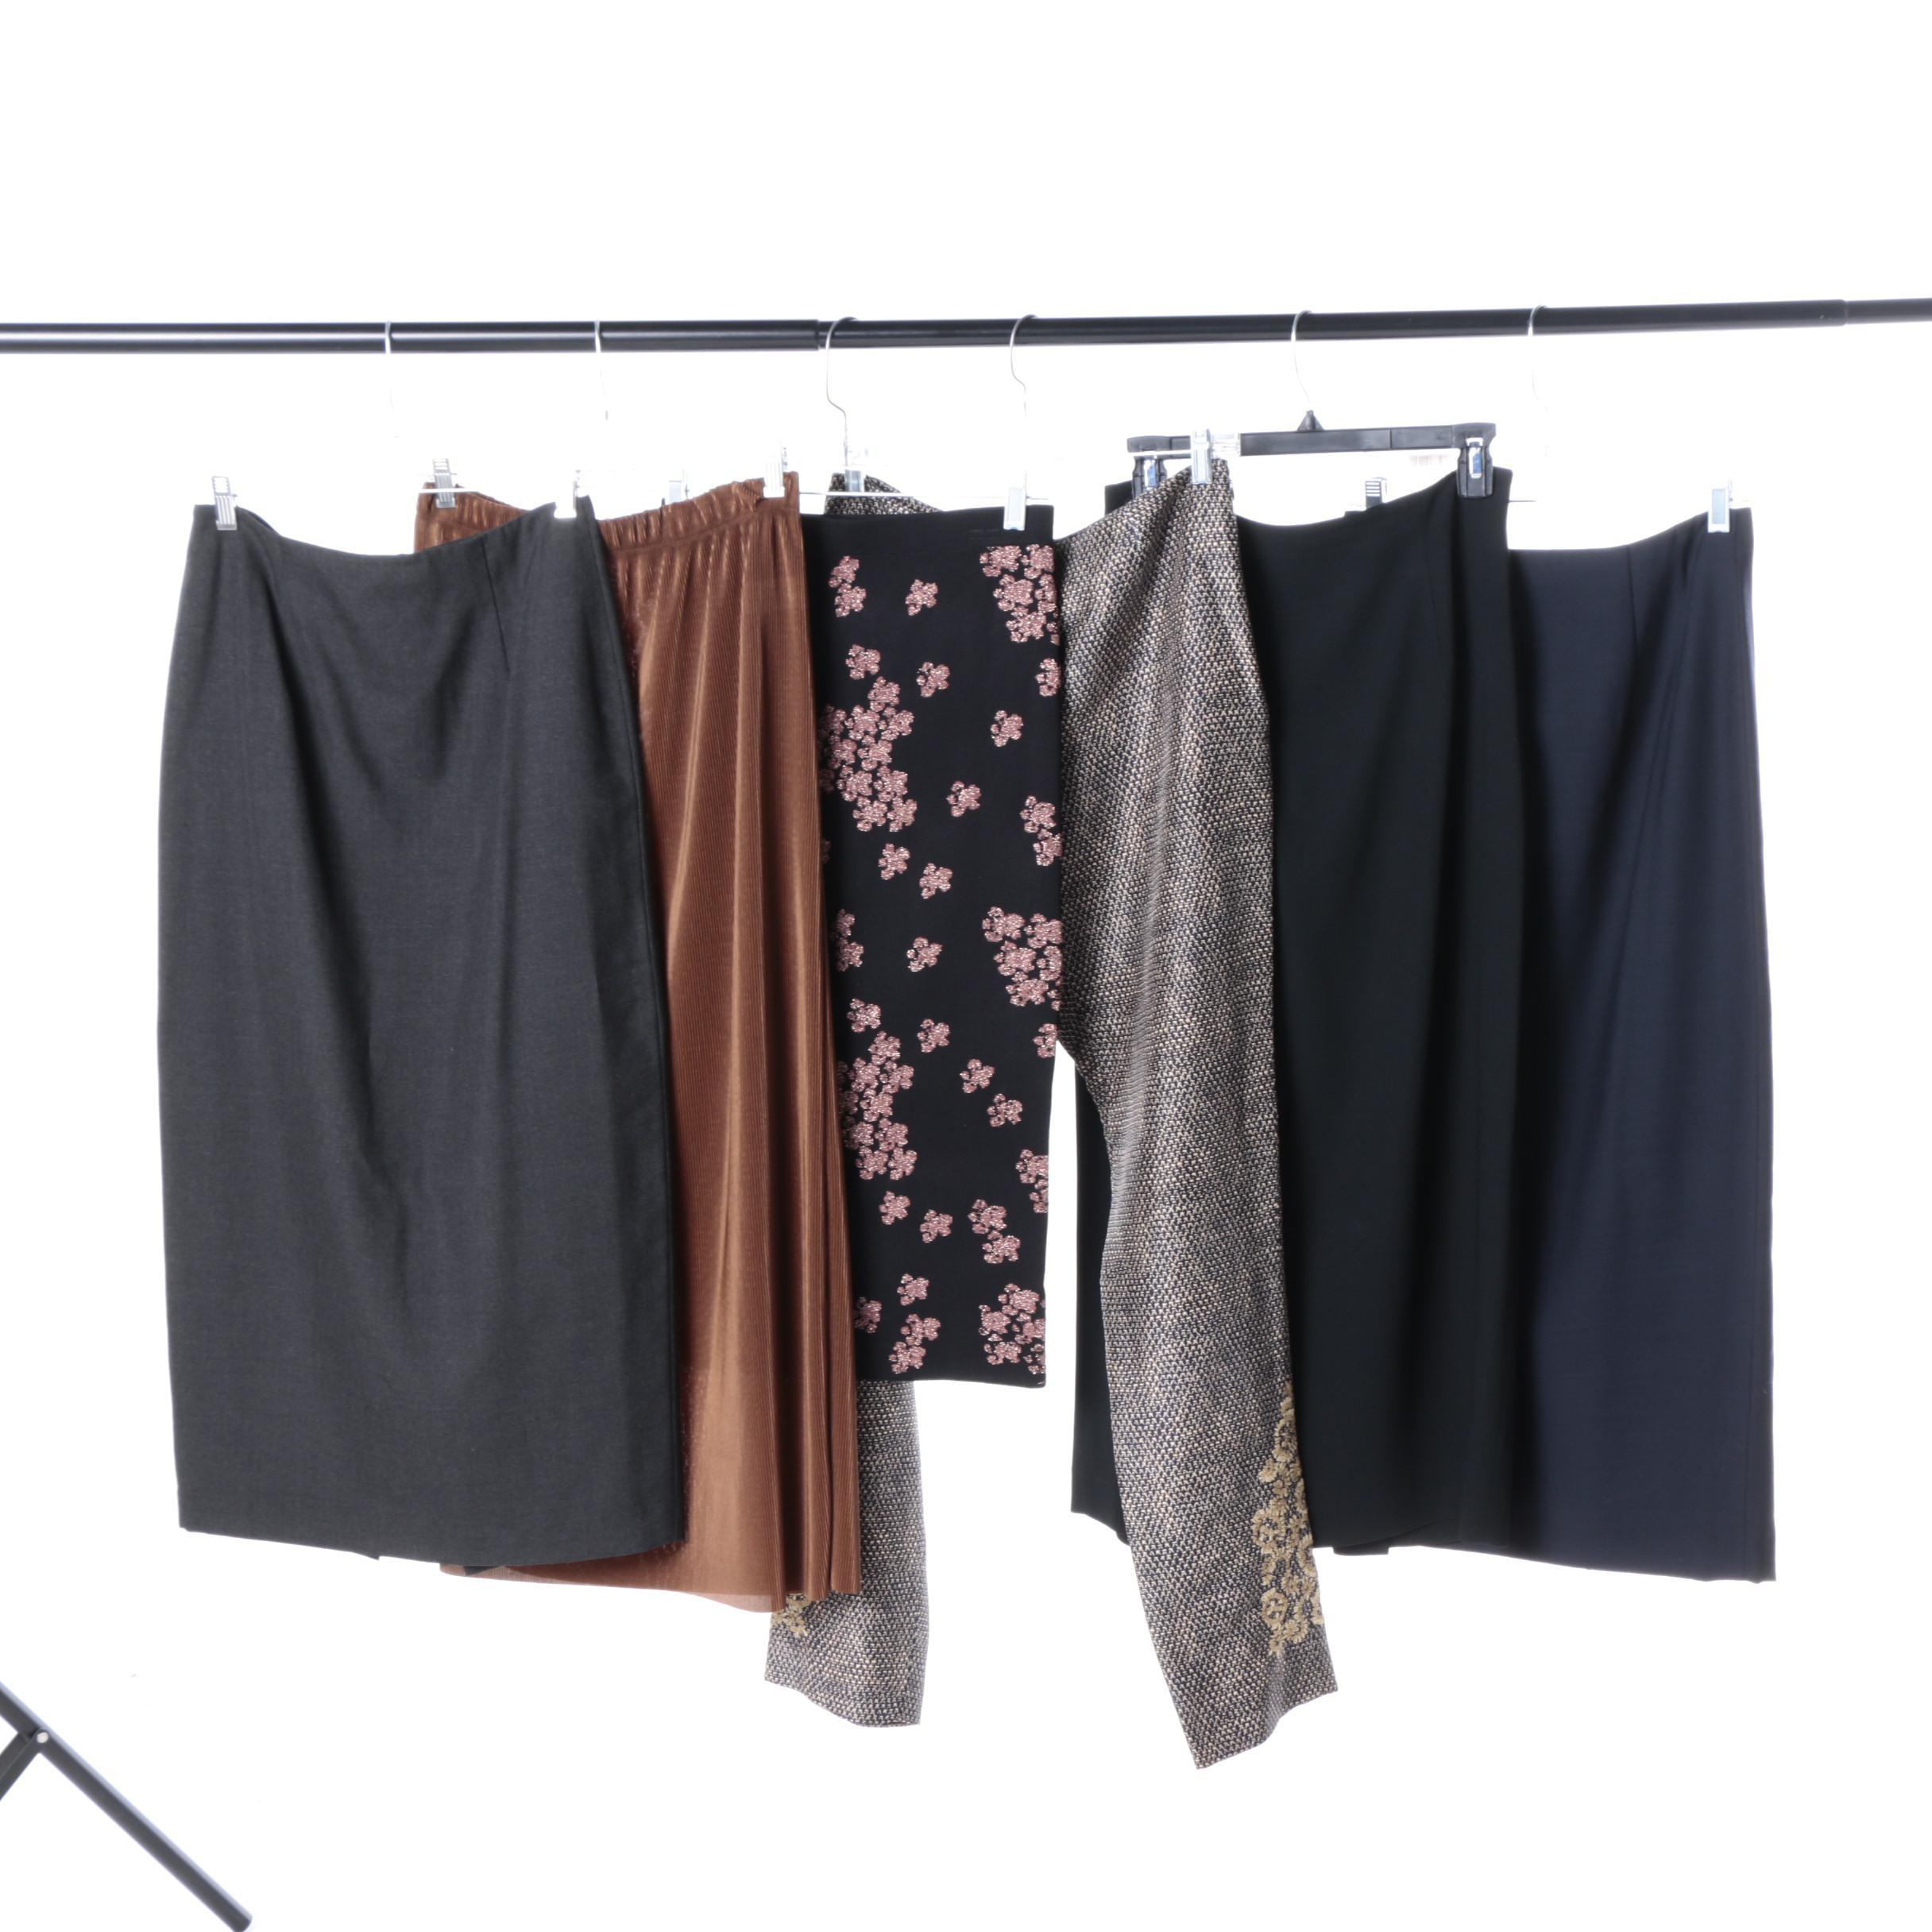 Casual Skirts and Dana Buchman Slacks